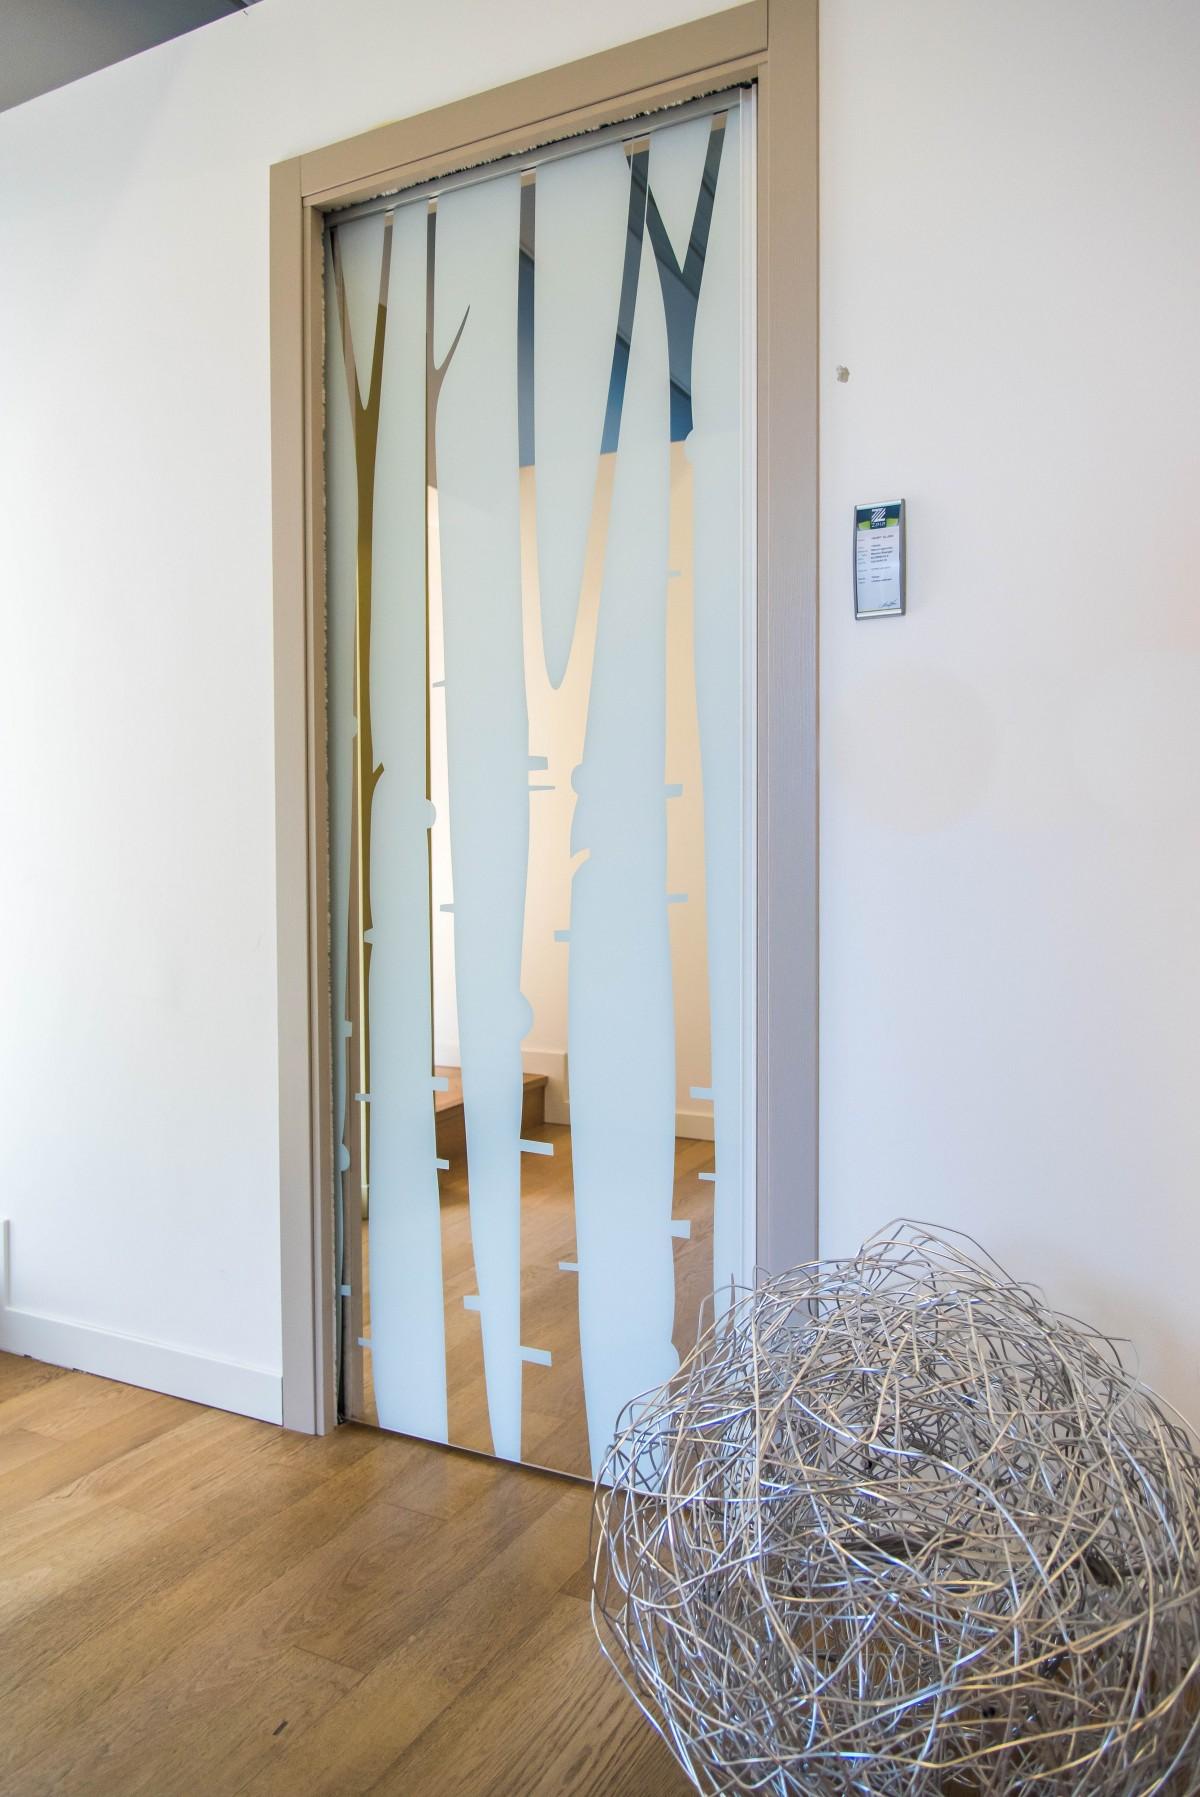 Fotos gratis madera piso pared iluminaci n puerta for Diseno puertas de madera interiores